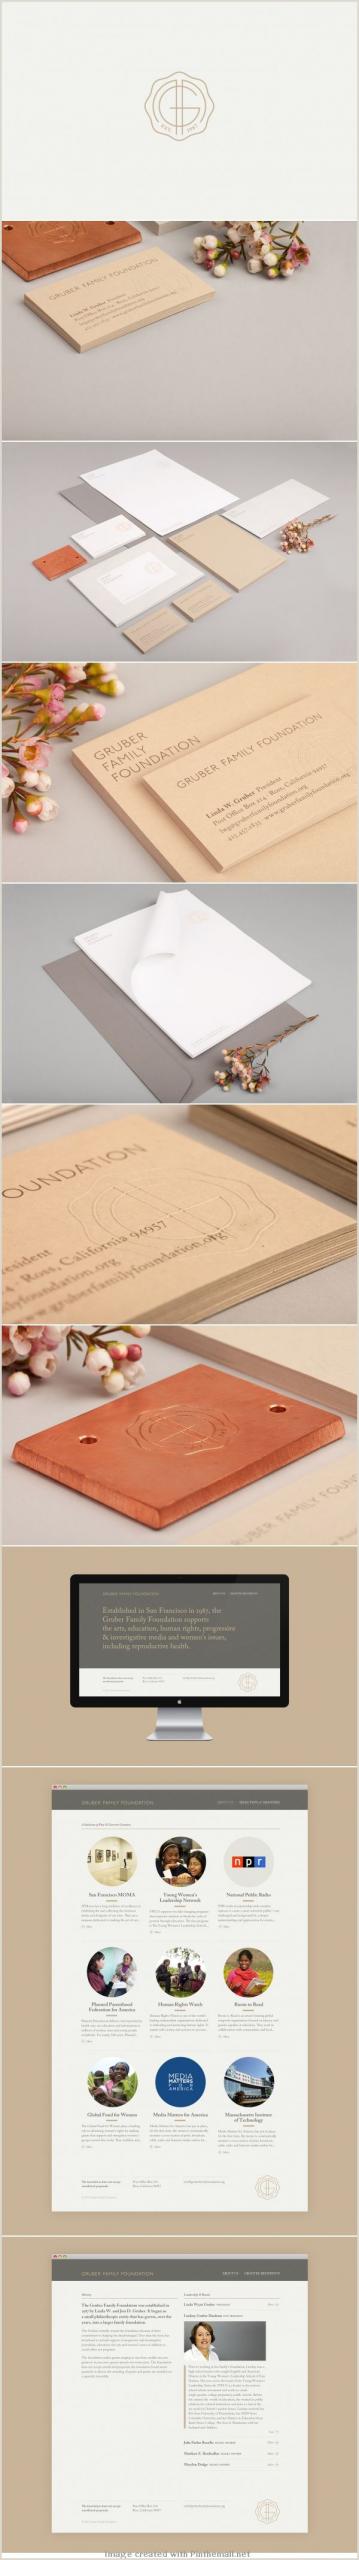 Good Card Designs 14 Popular Hardwood Flooring Business Card Template